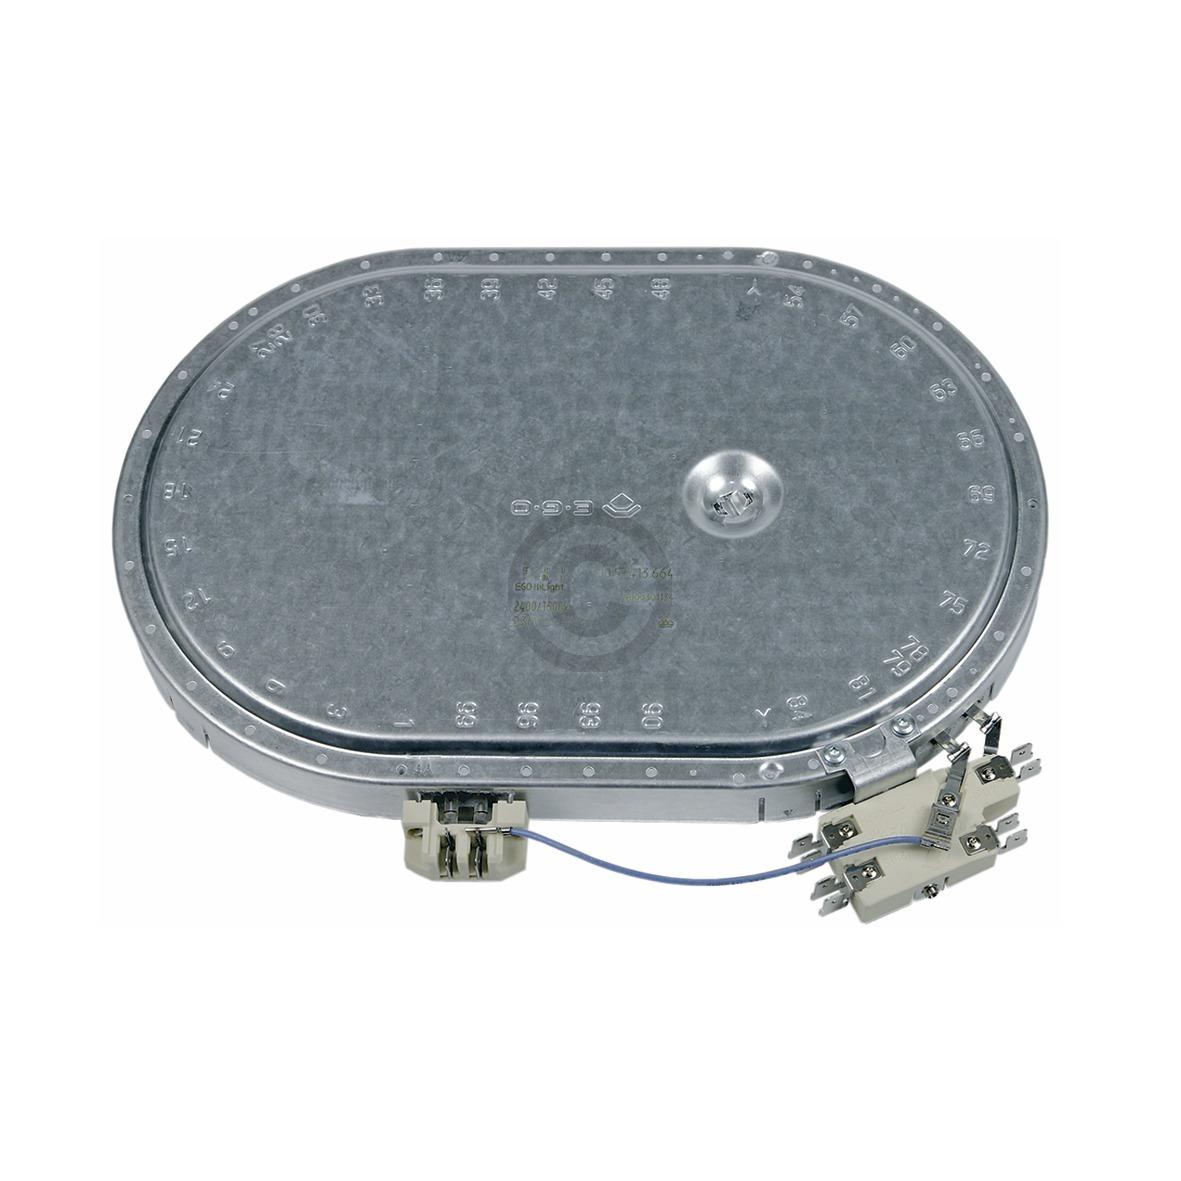 Strahlheizkörper 260x165mm 2400/1600W 230V oval, OT! NF! 00670016 670016 Bosch,